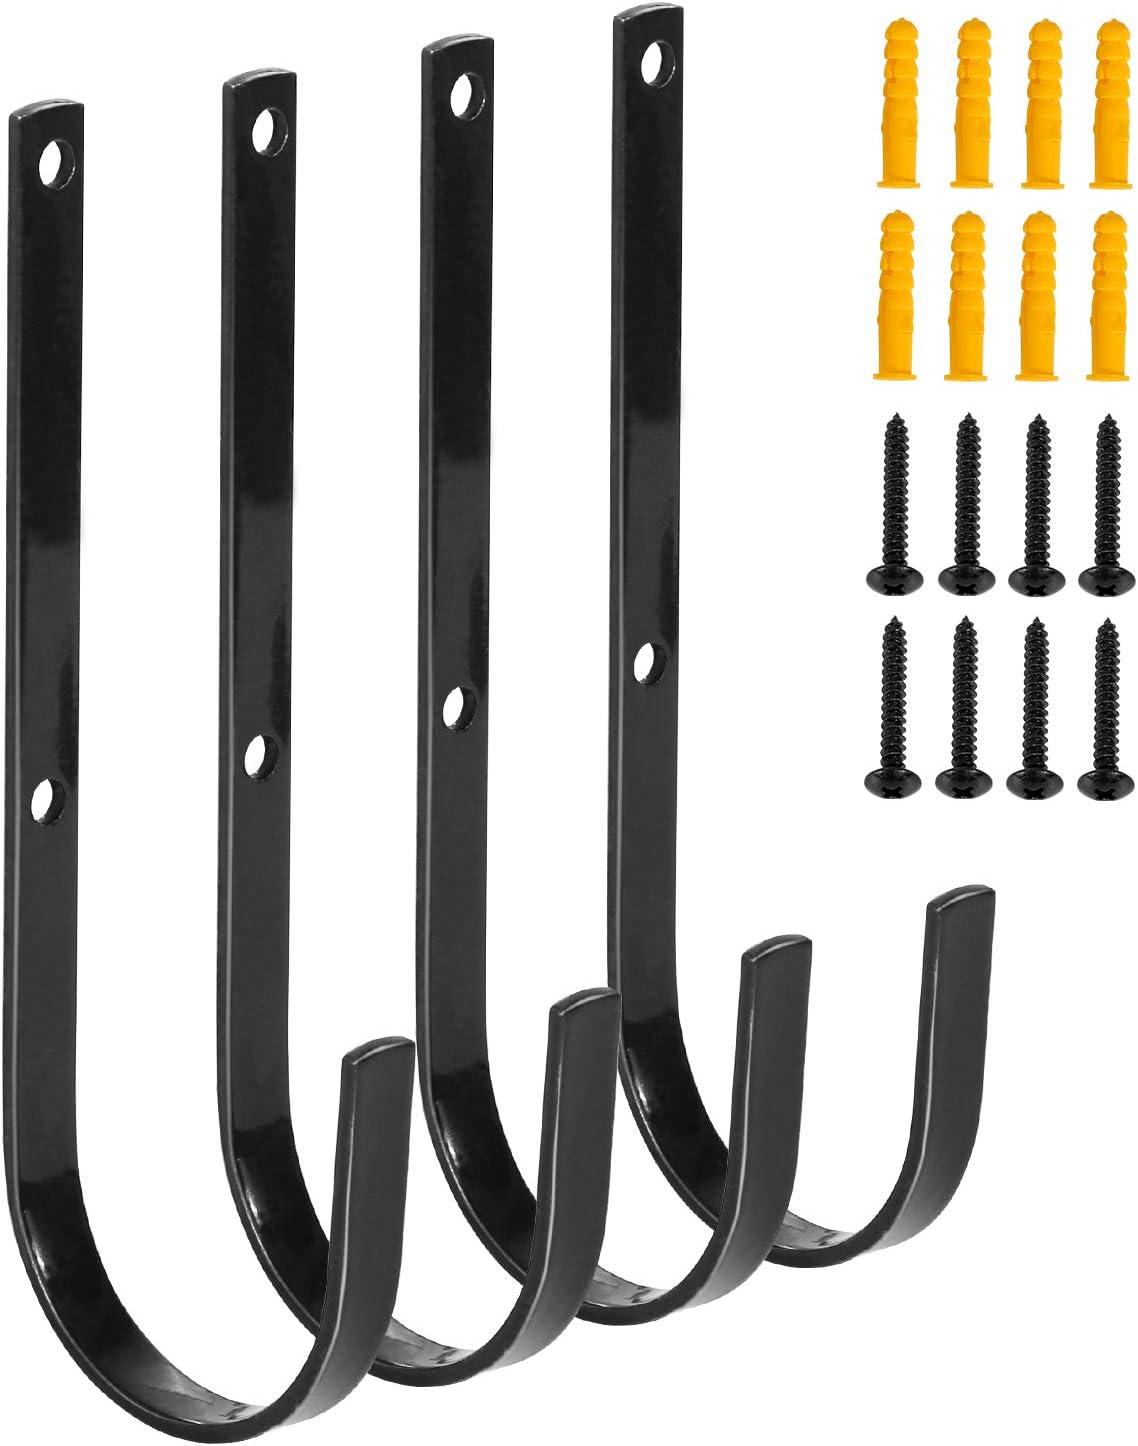 Redcamp Black Iron Heavy Duty Storage Utility Hooks,Set of 4/8,Large Garage Hooks Wall Mount for Hanging Storage Garden Tools